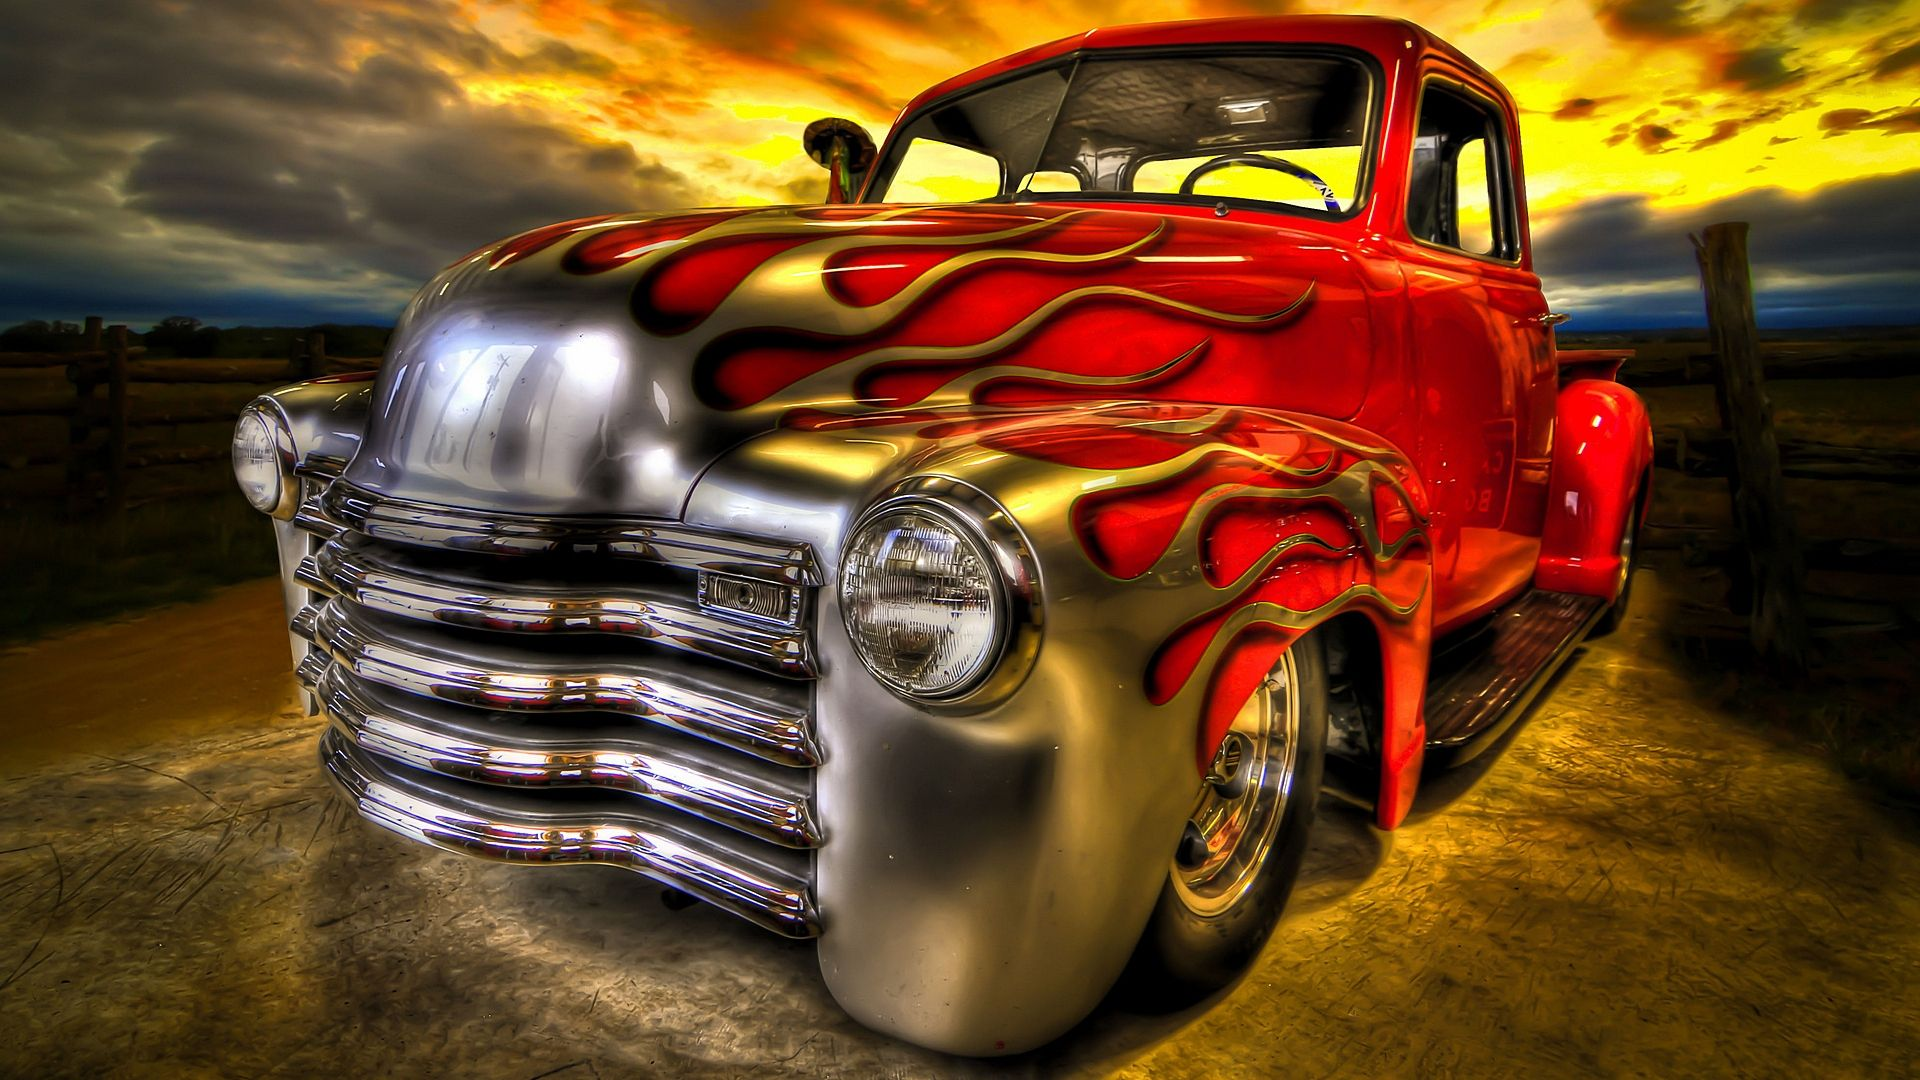 Flamed Chevy Truck Desktop Wallpaper 1920x1080 Old Trucks Truck Wallpapers Classic Trucks